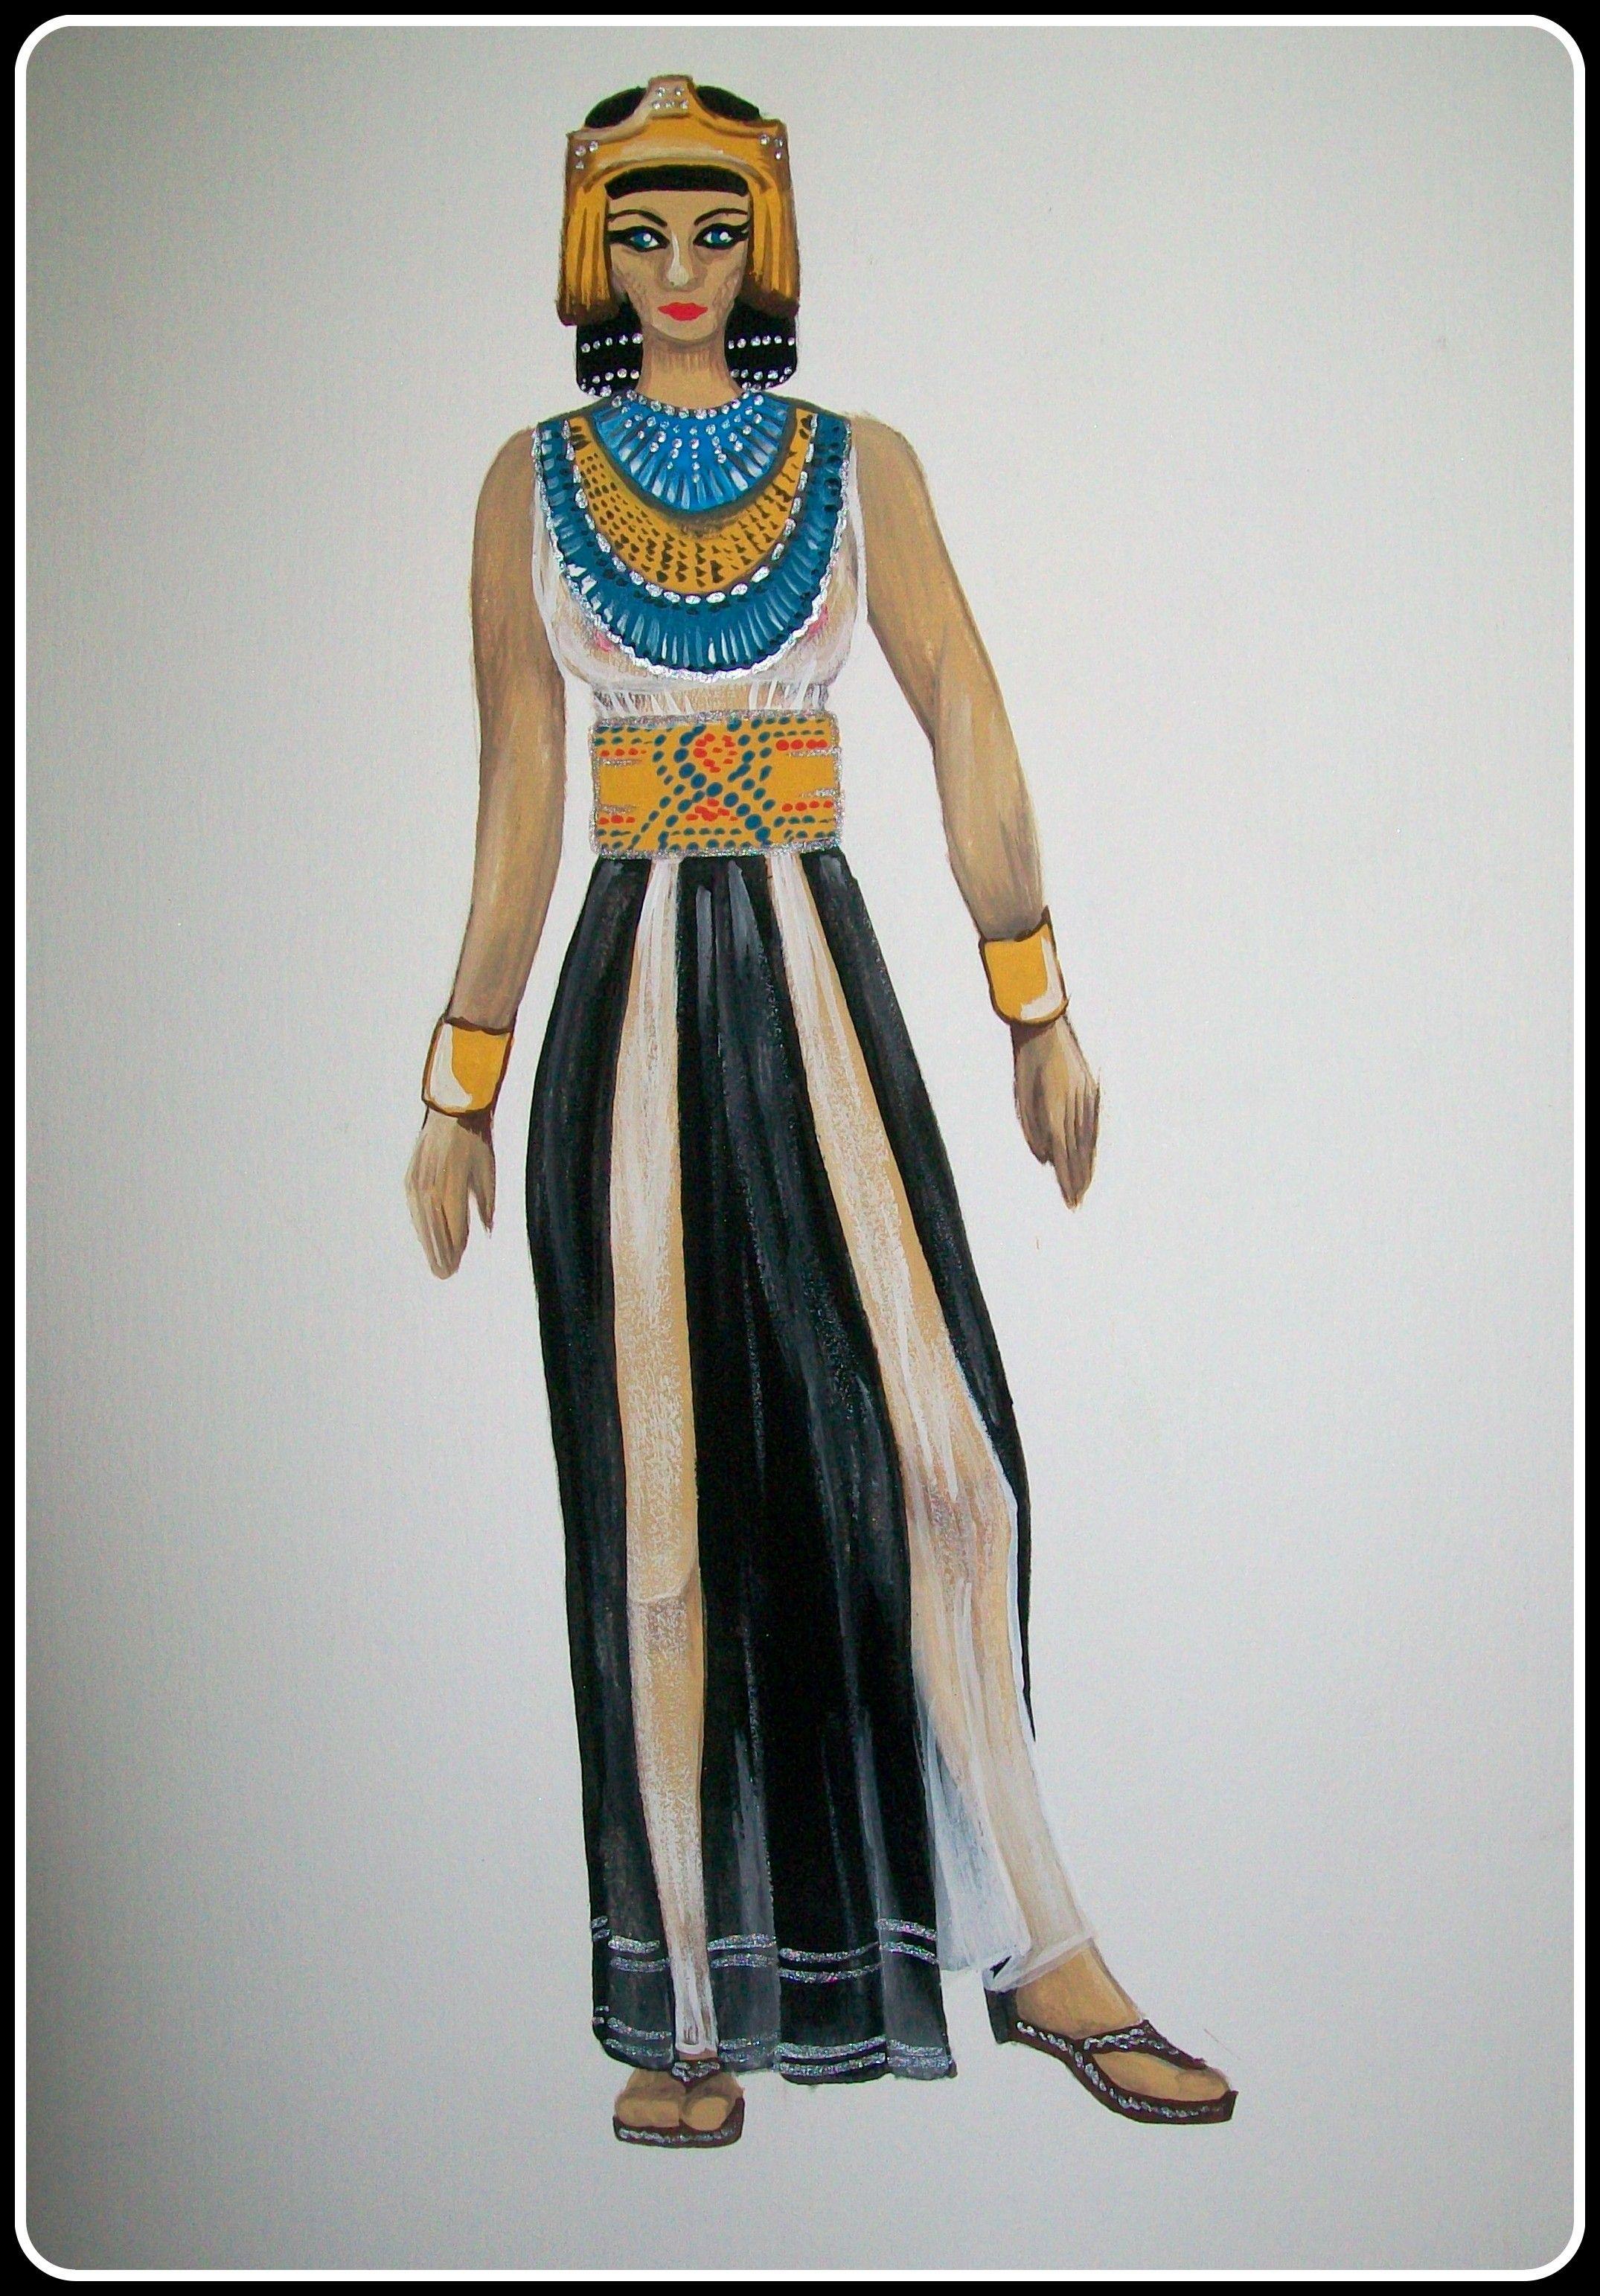 a1f2c1f31c Período Egipcio- Vestuario femenino